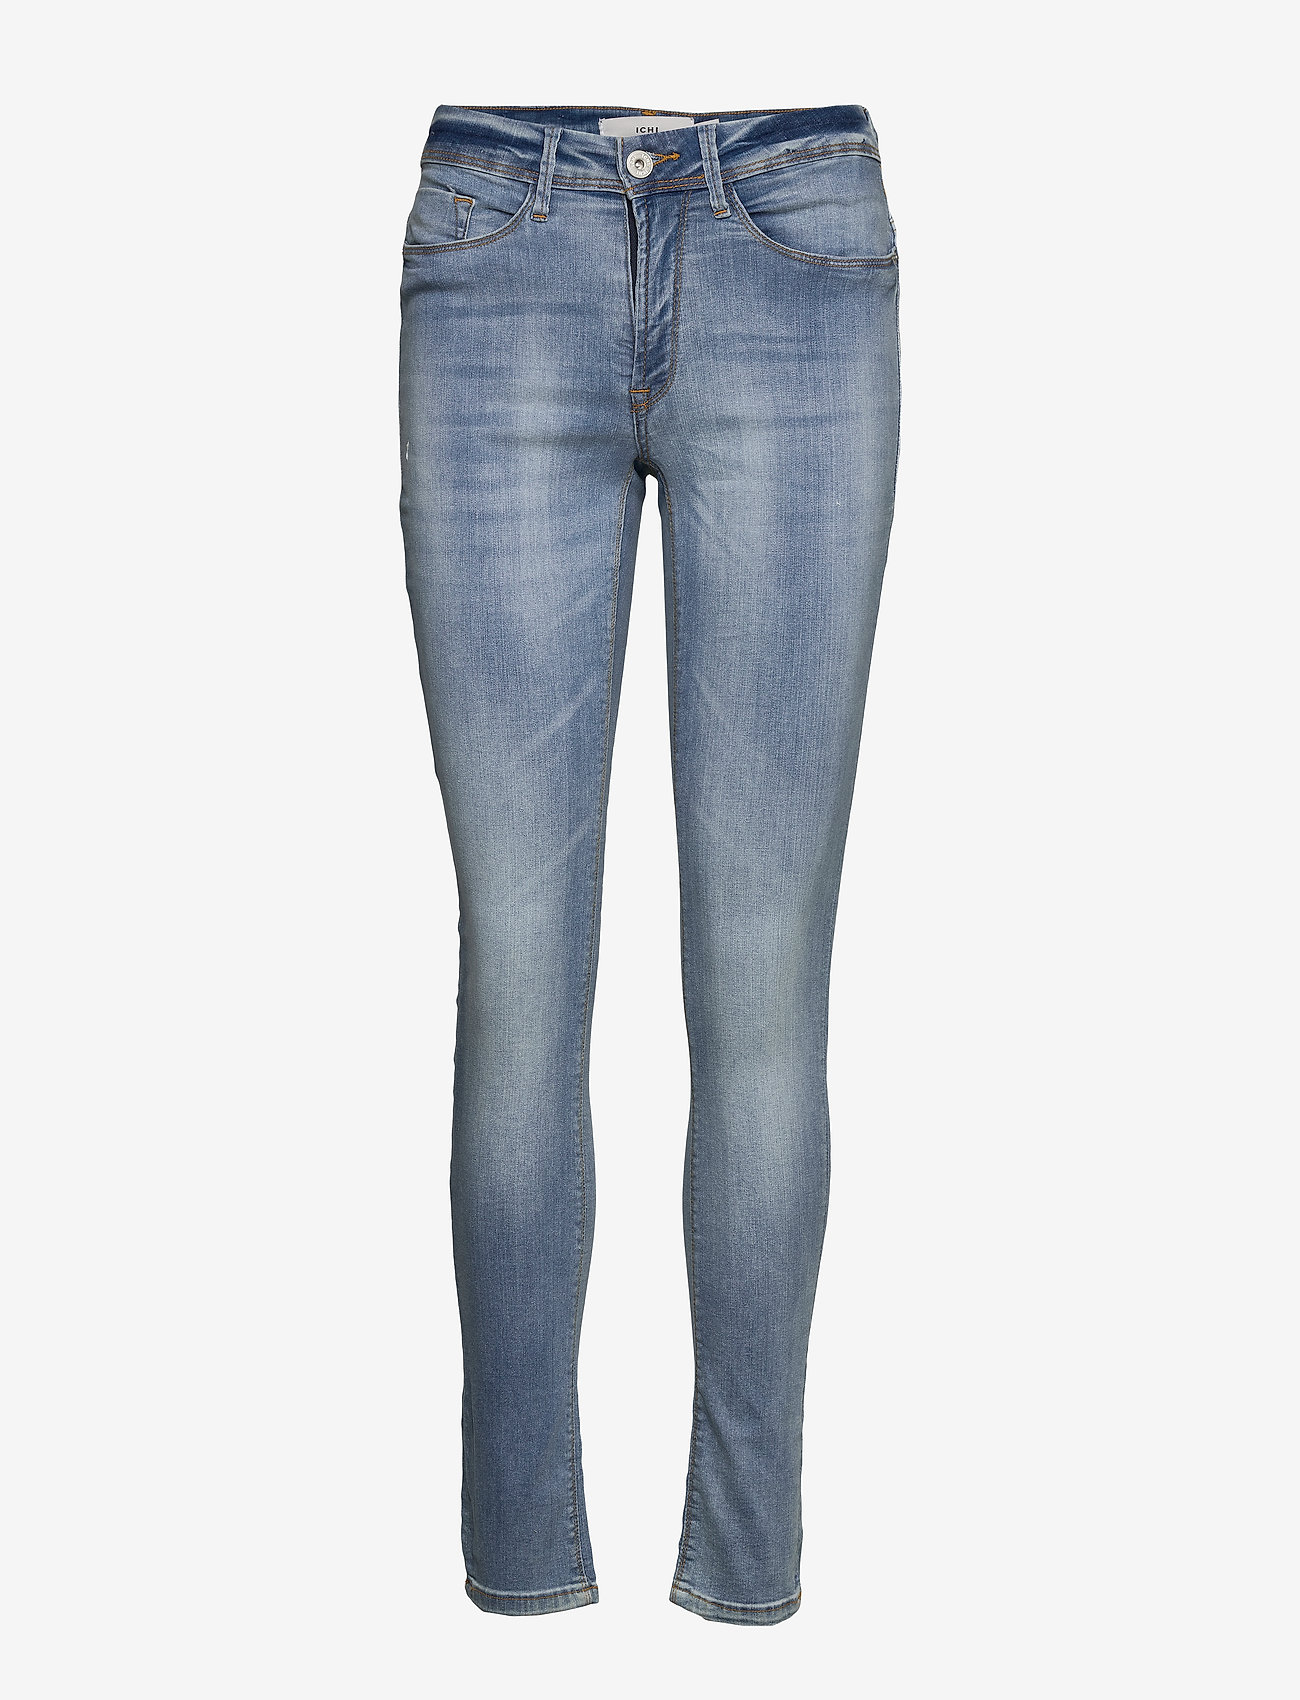 ICHI - IHERIN IZARO LIGHT BLUE BLEACHED - skinny jeans - bleached light blue - 0